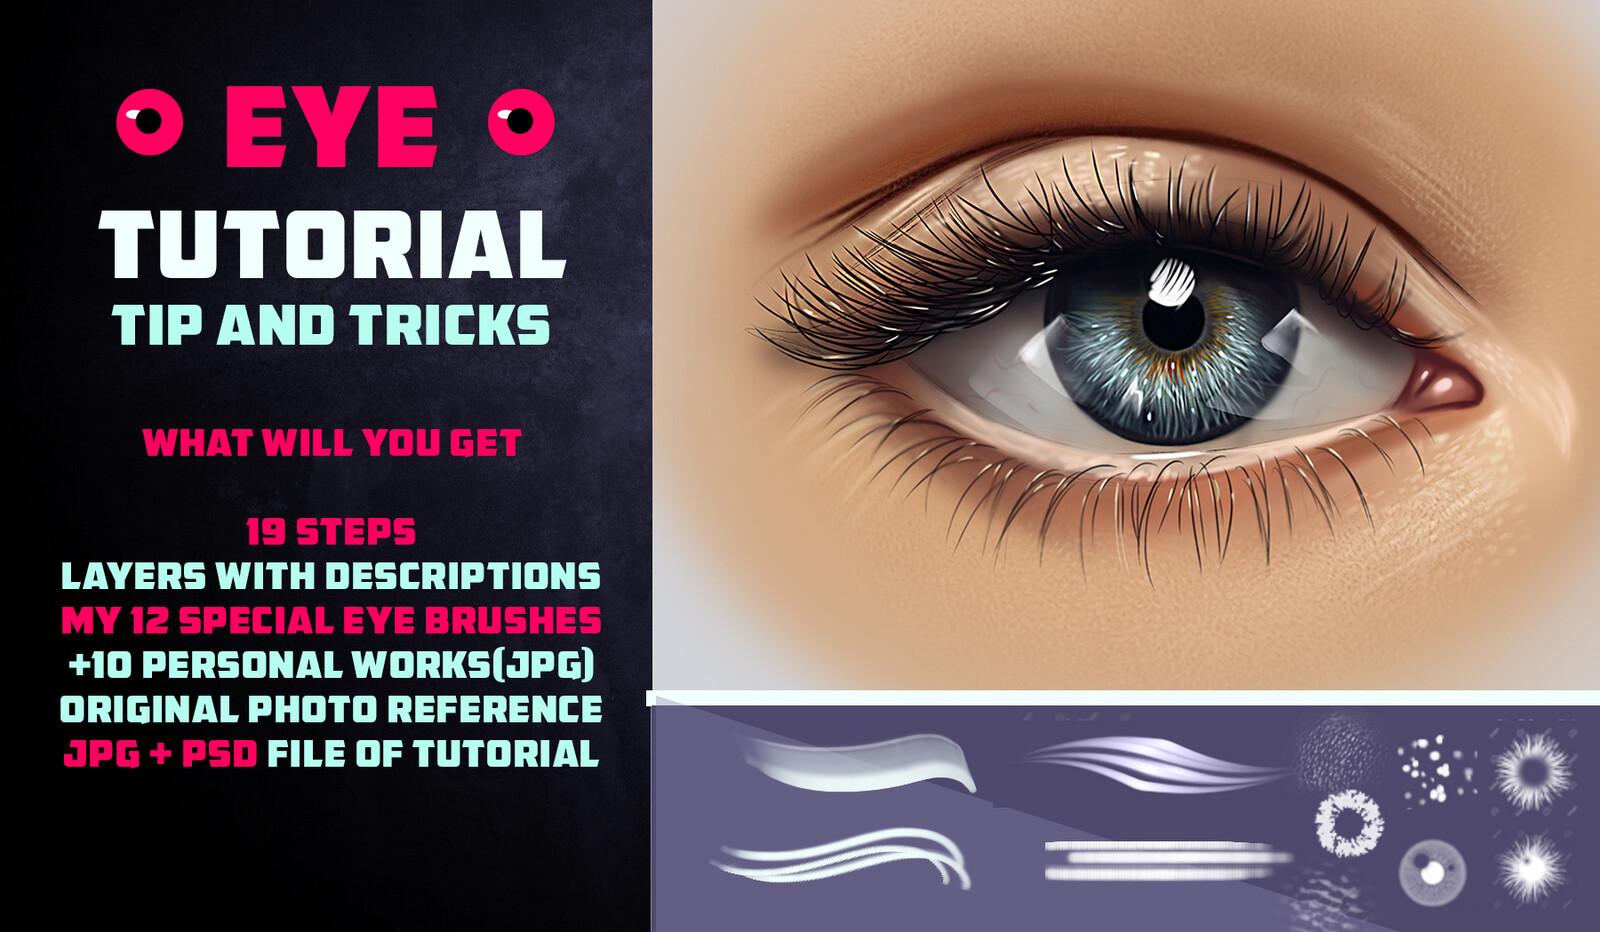 Artstation Marketplace Link: https://www.artstation.com/vurdem/store/j35r/eye-tutorial-2-12-brushes-tip-and-tricks-photoshop